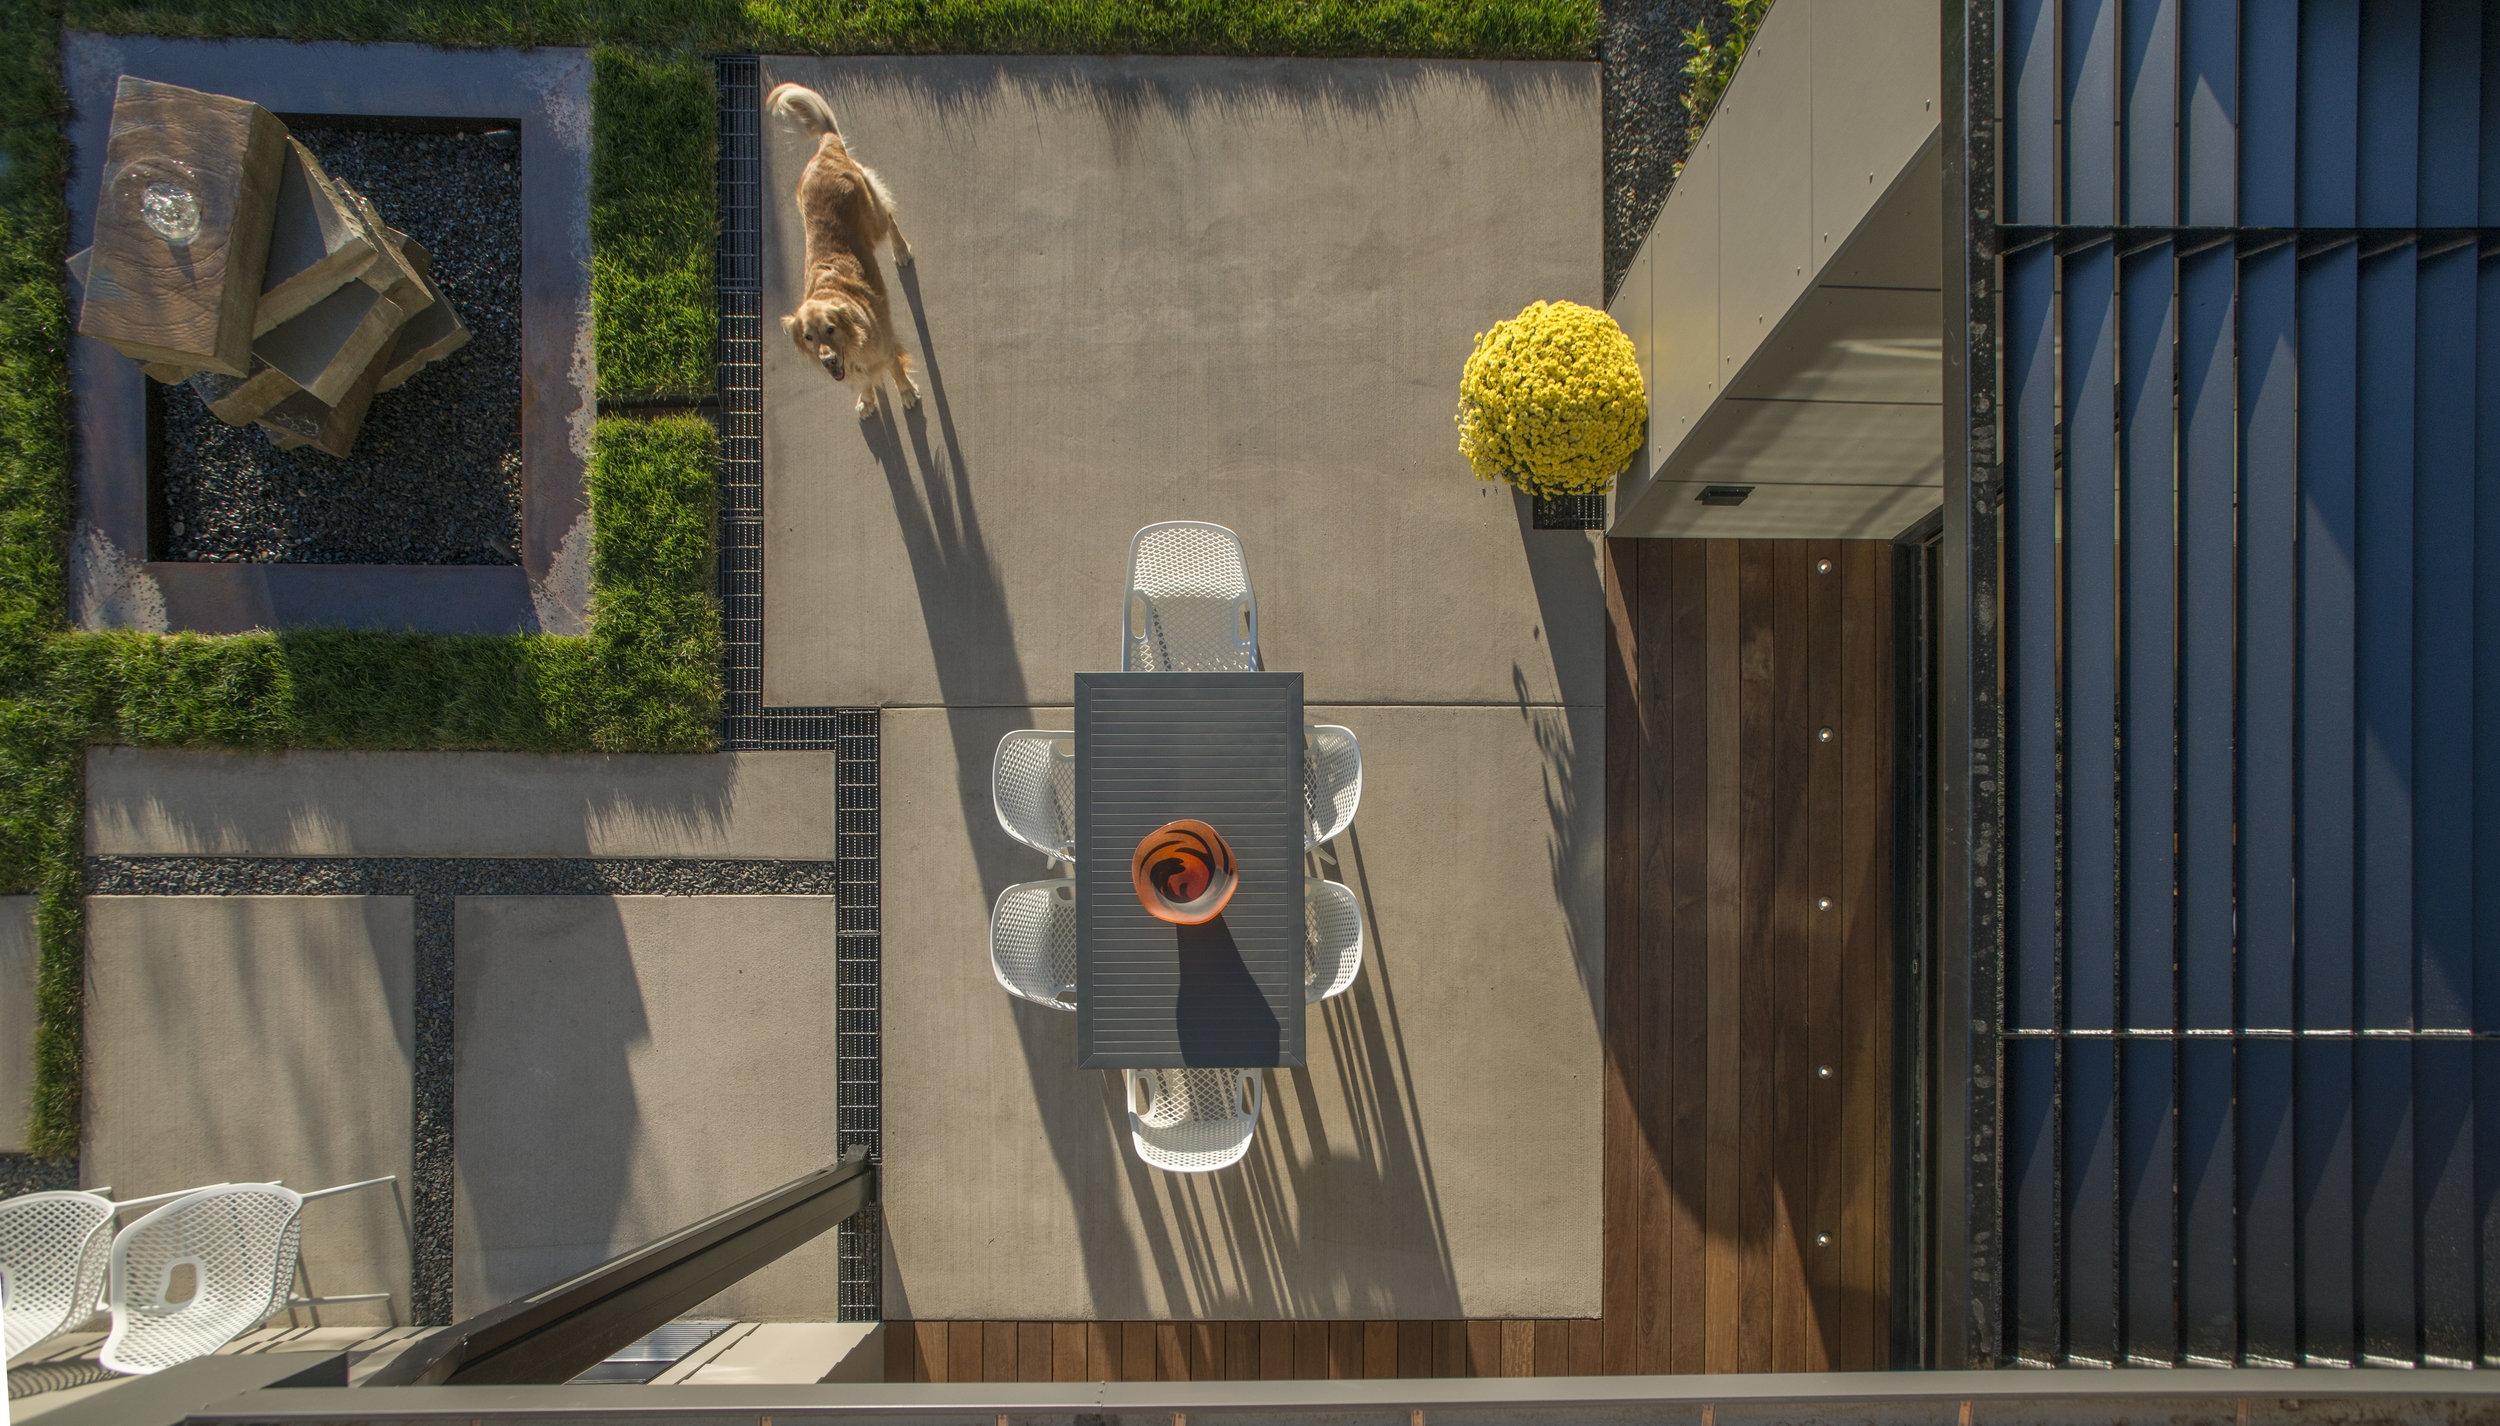 Every dog's dream yard  - Feng Shui and a recirculating drinking fountain. Trimbach Builders, Bozeman